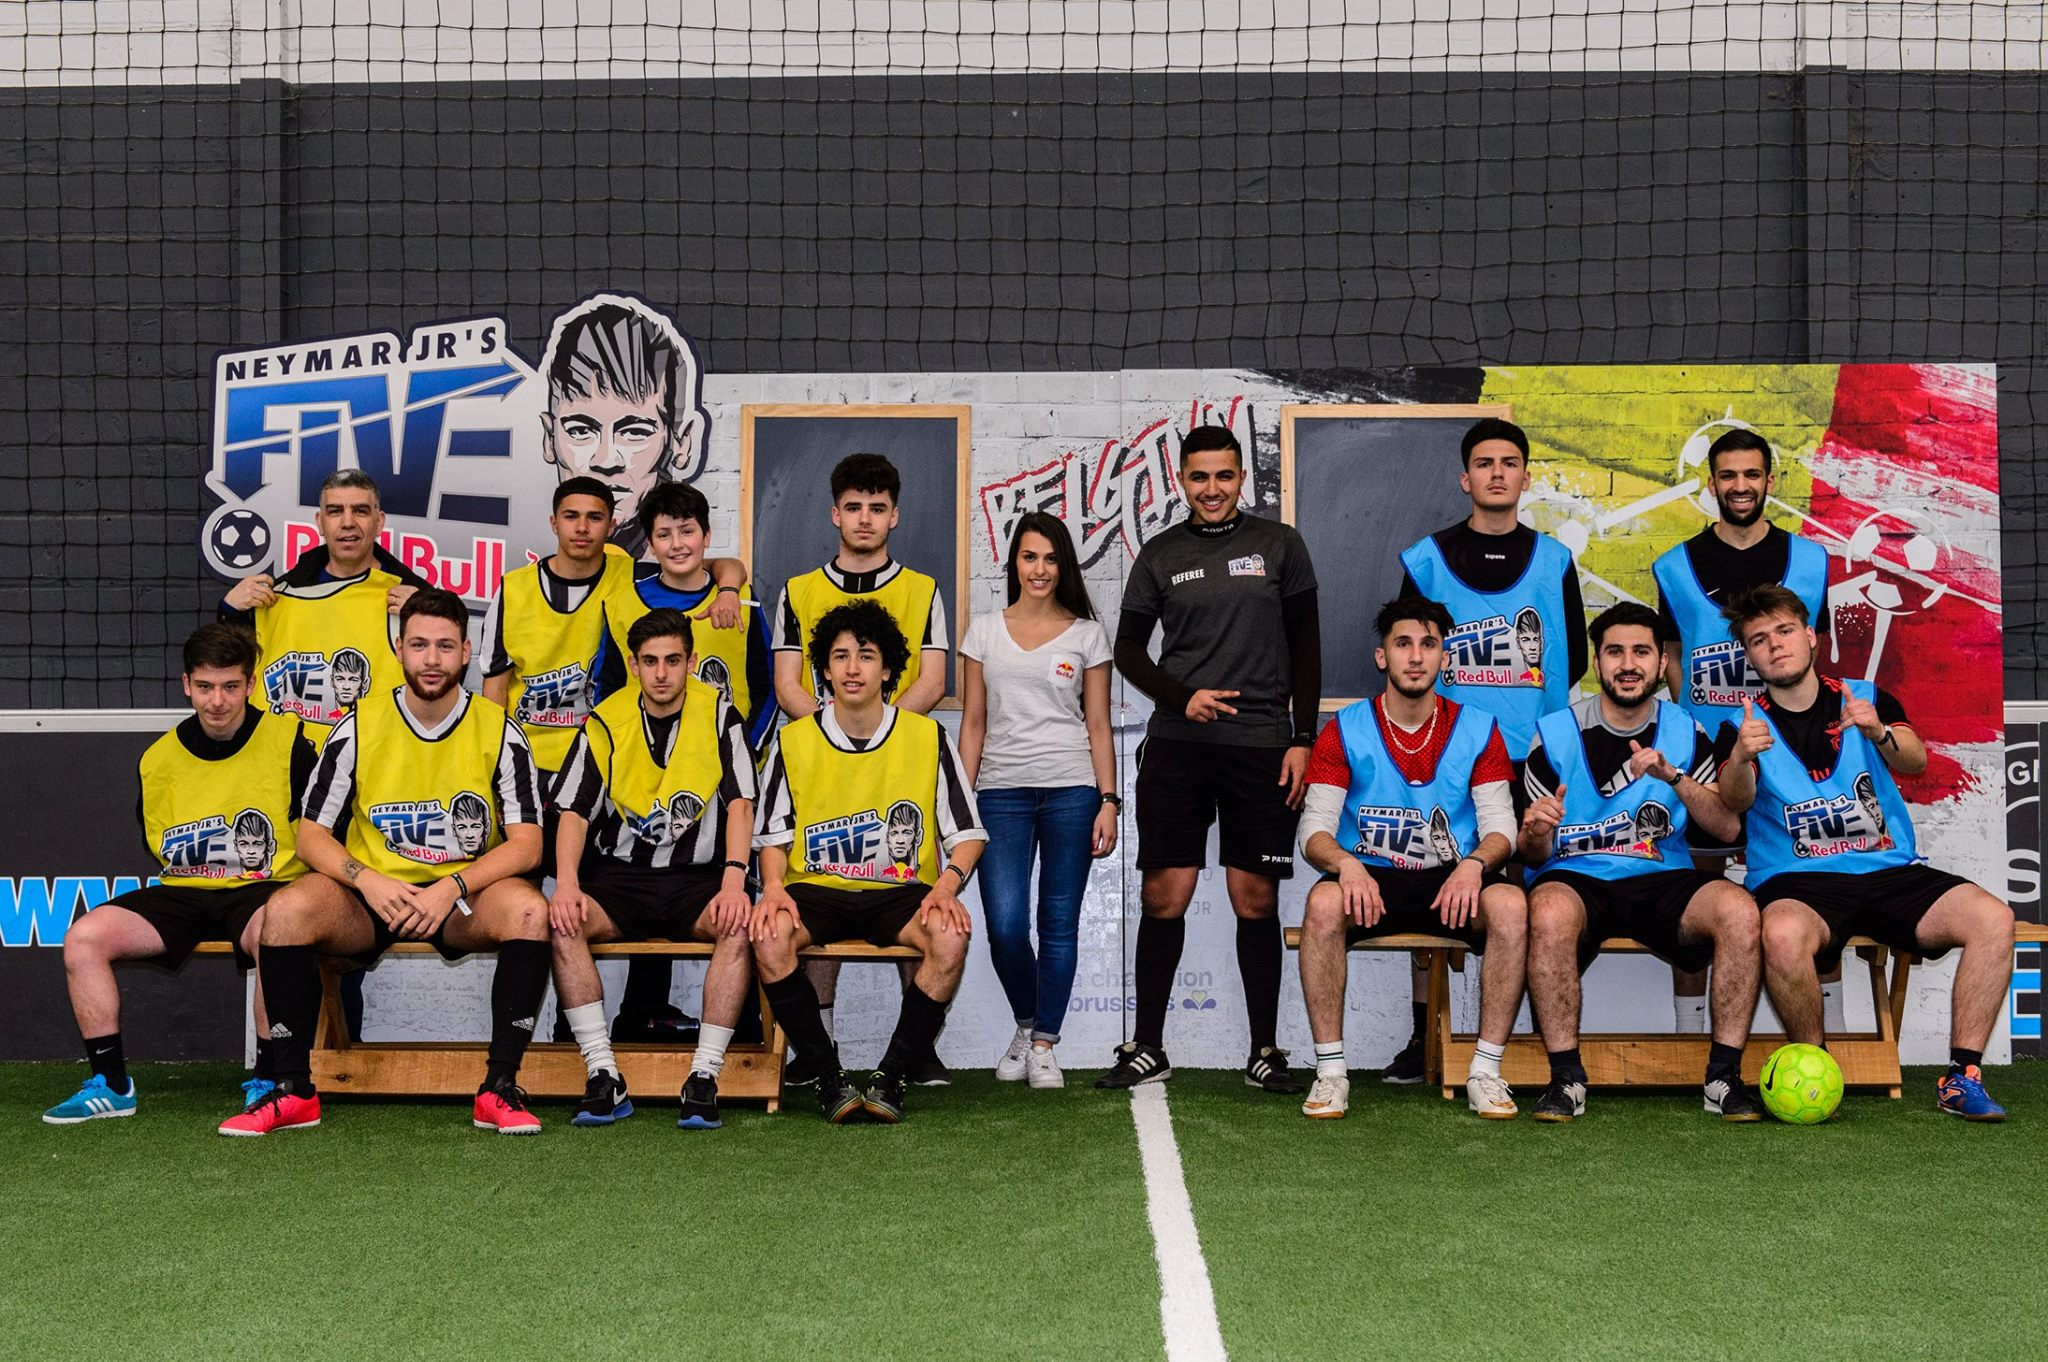 Neymar-Jr's-Five